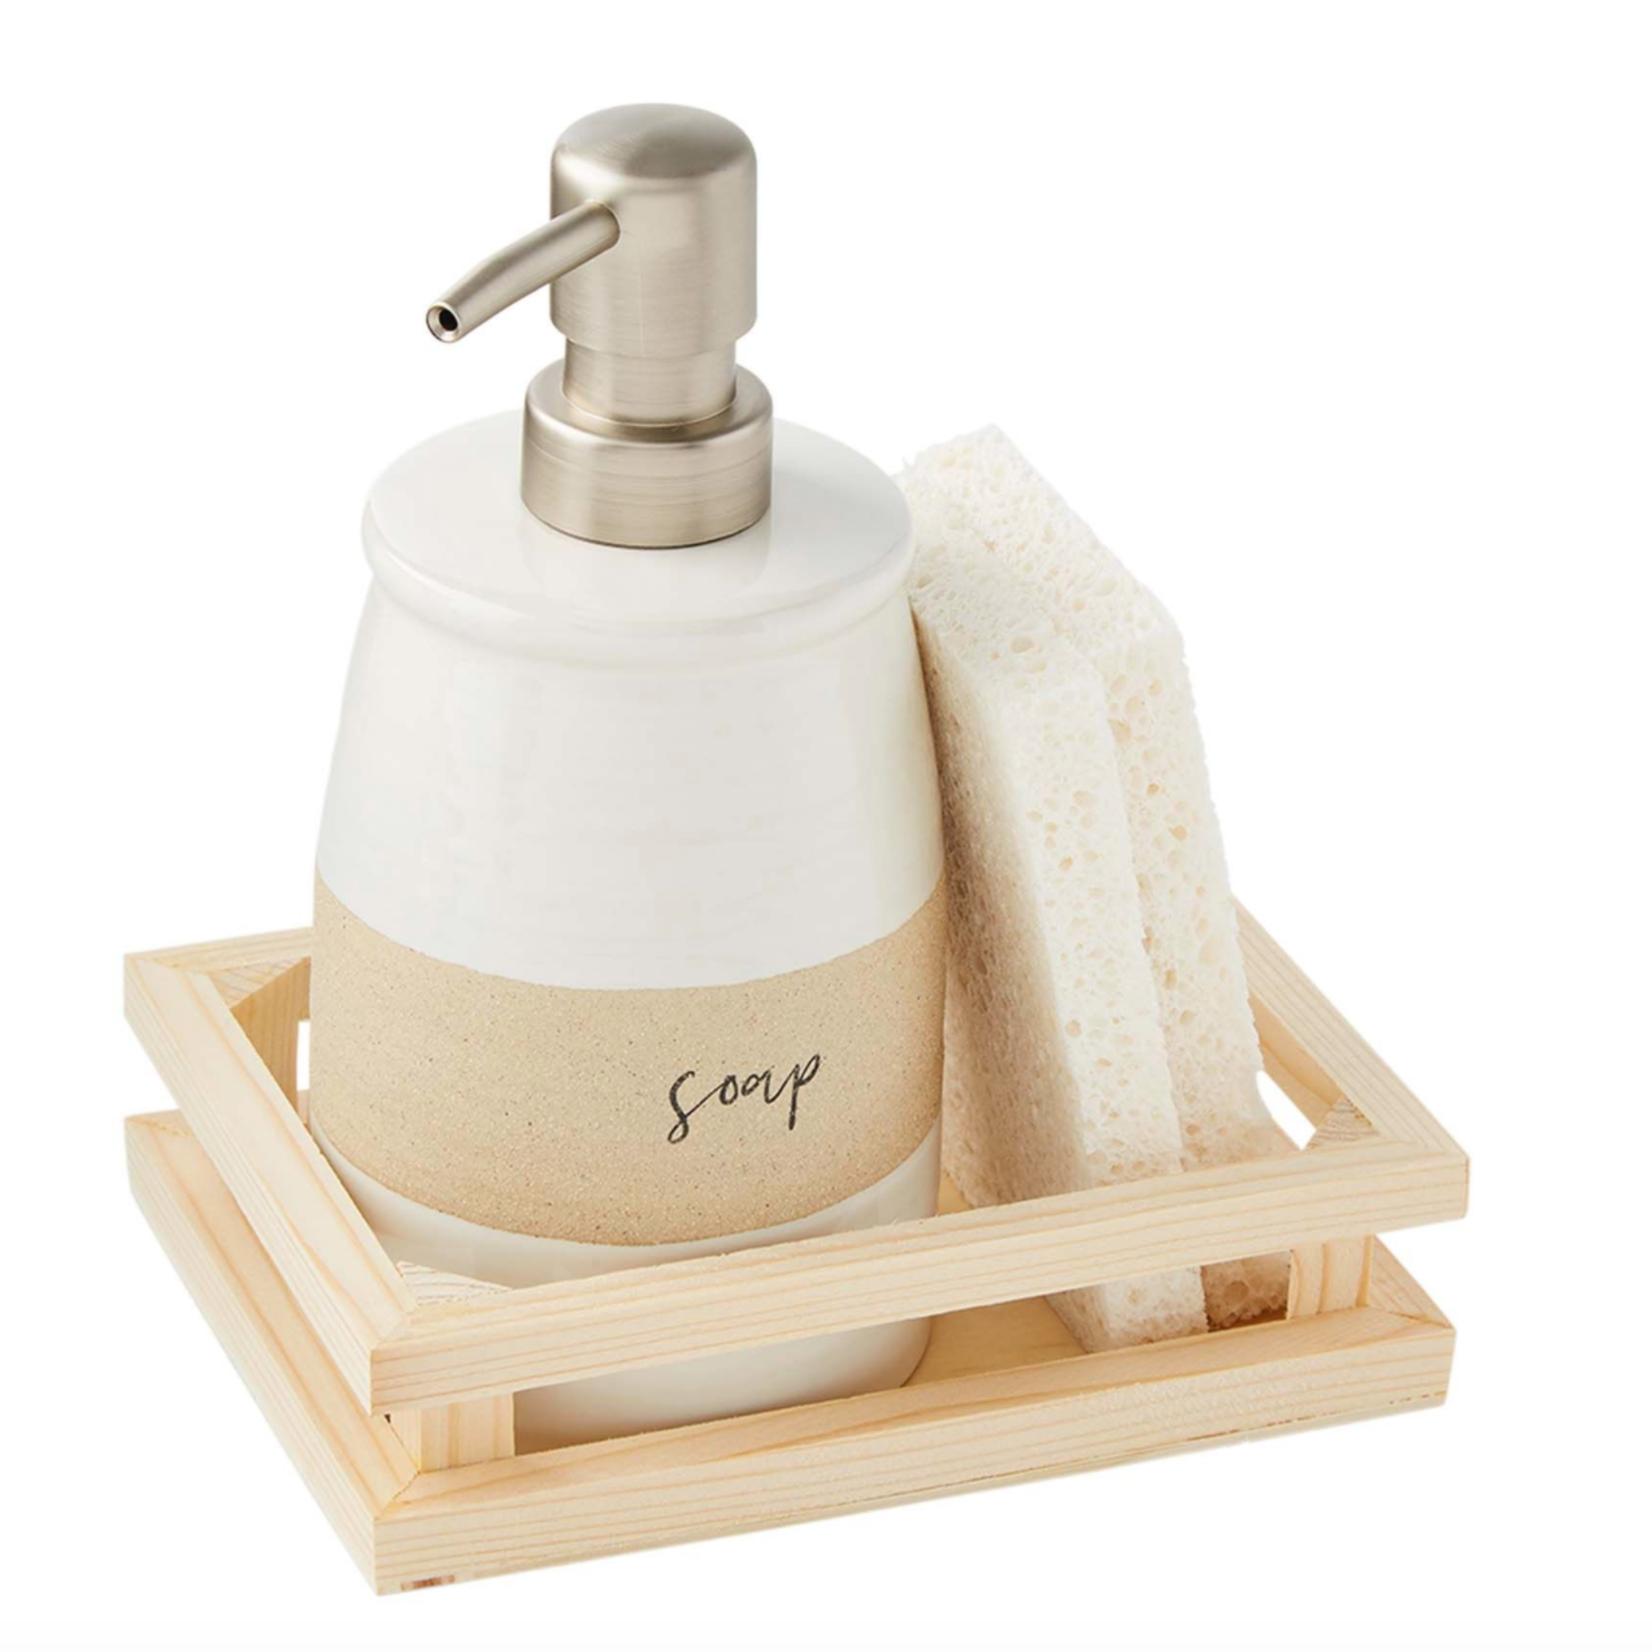 Stoneware Soap and Sponge Set